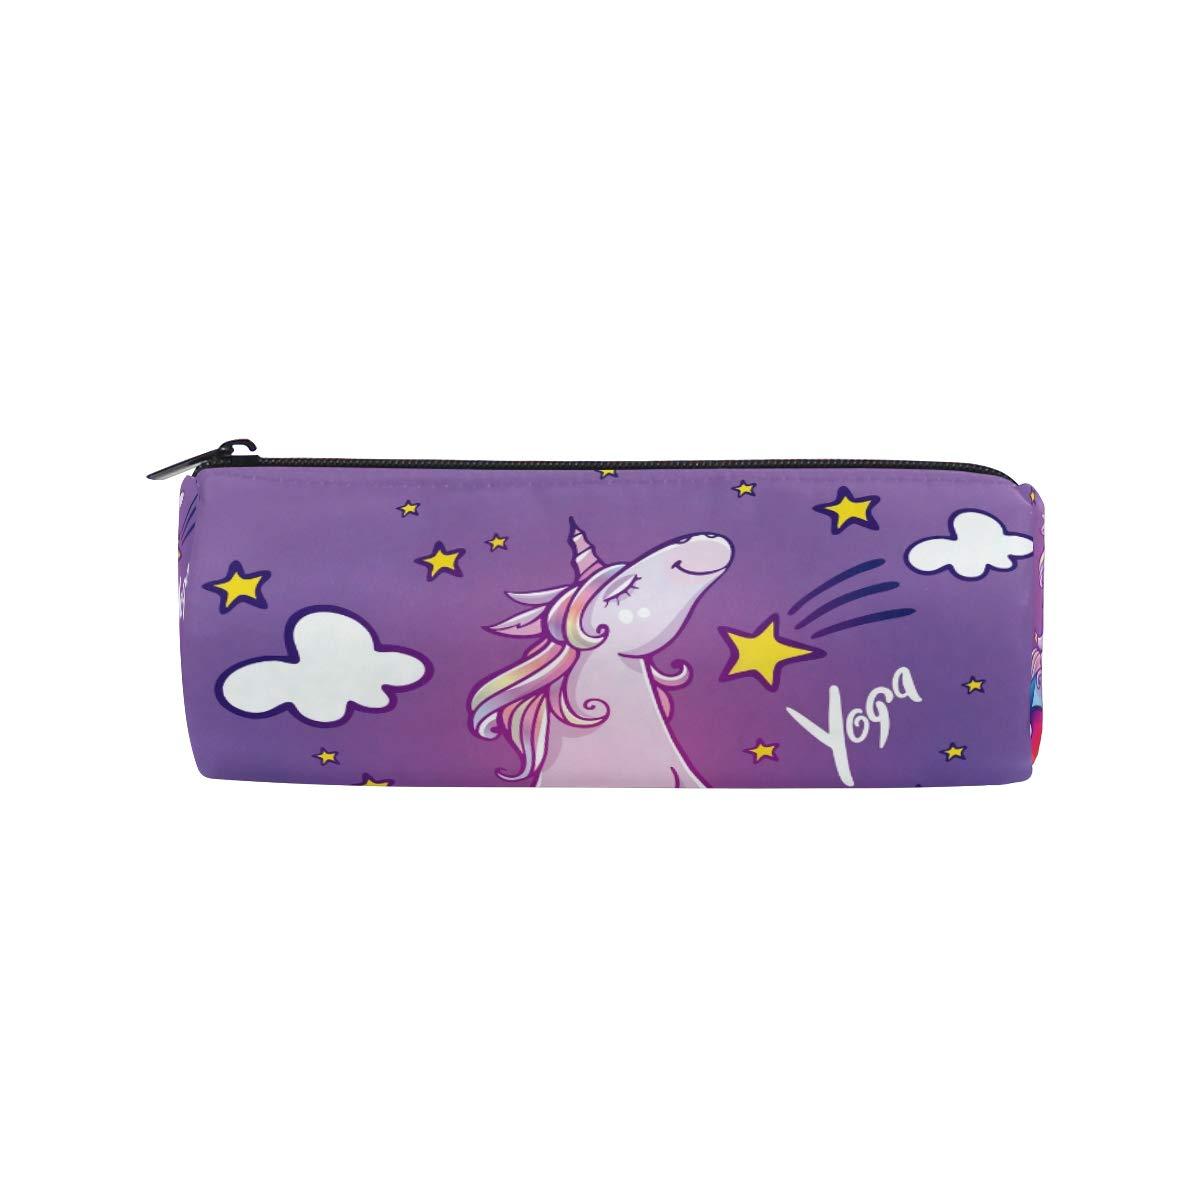 Divertido estuche de unicornio para hacer yoga, arcoíris ...